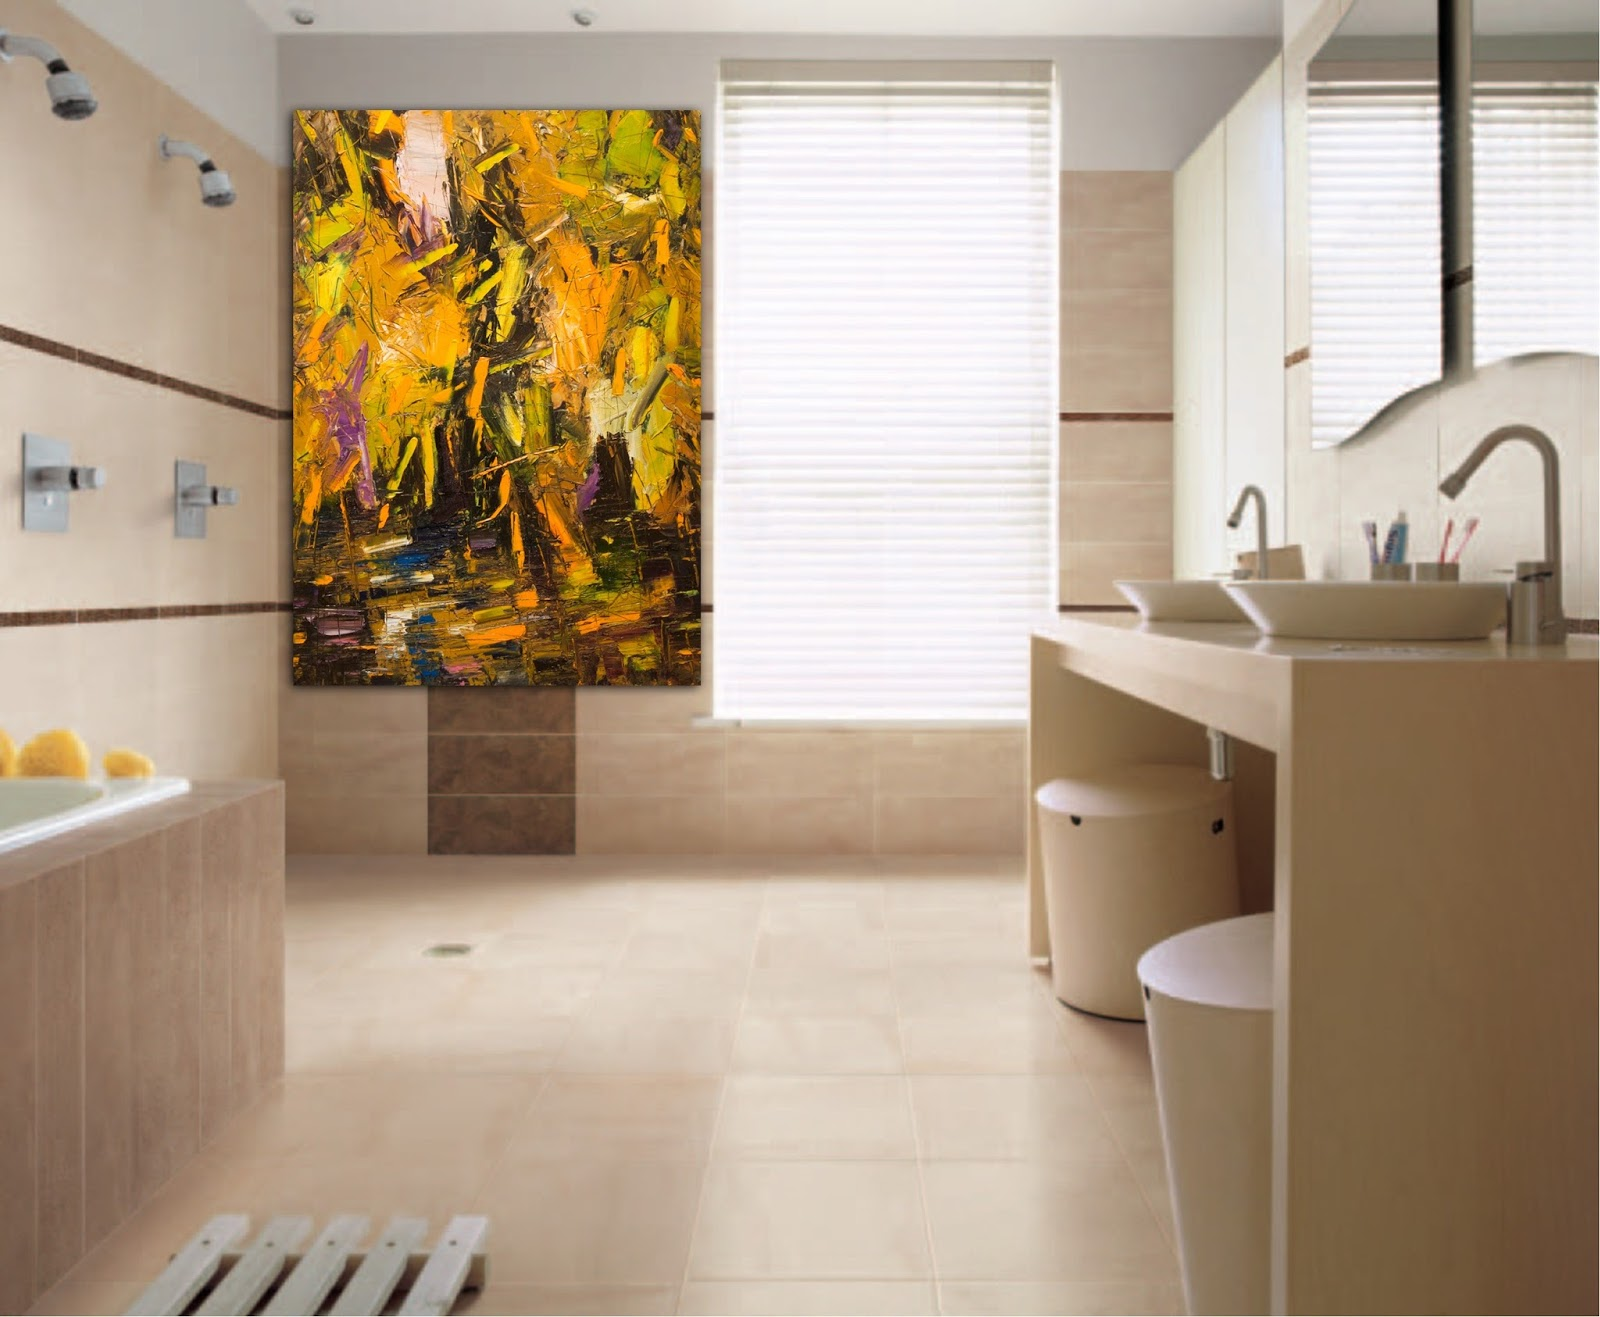 Vasca Da Bagno Su Misura : Arte su misura valorizzare la stanza da bagno con arte su misura